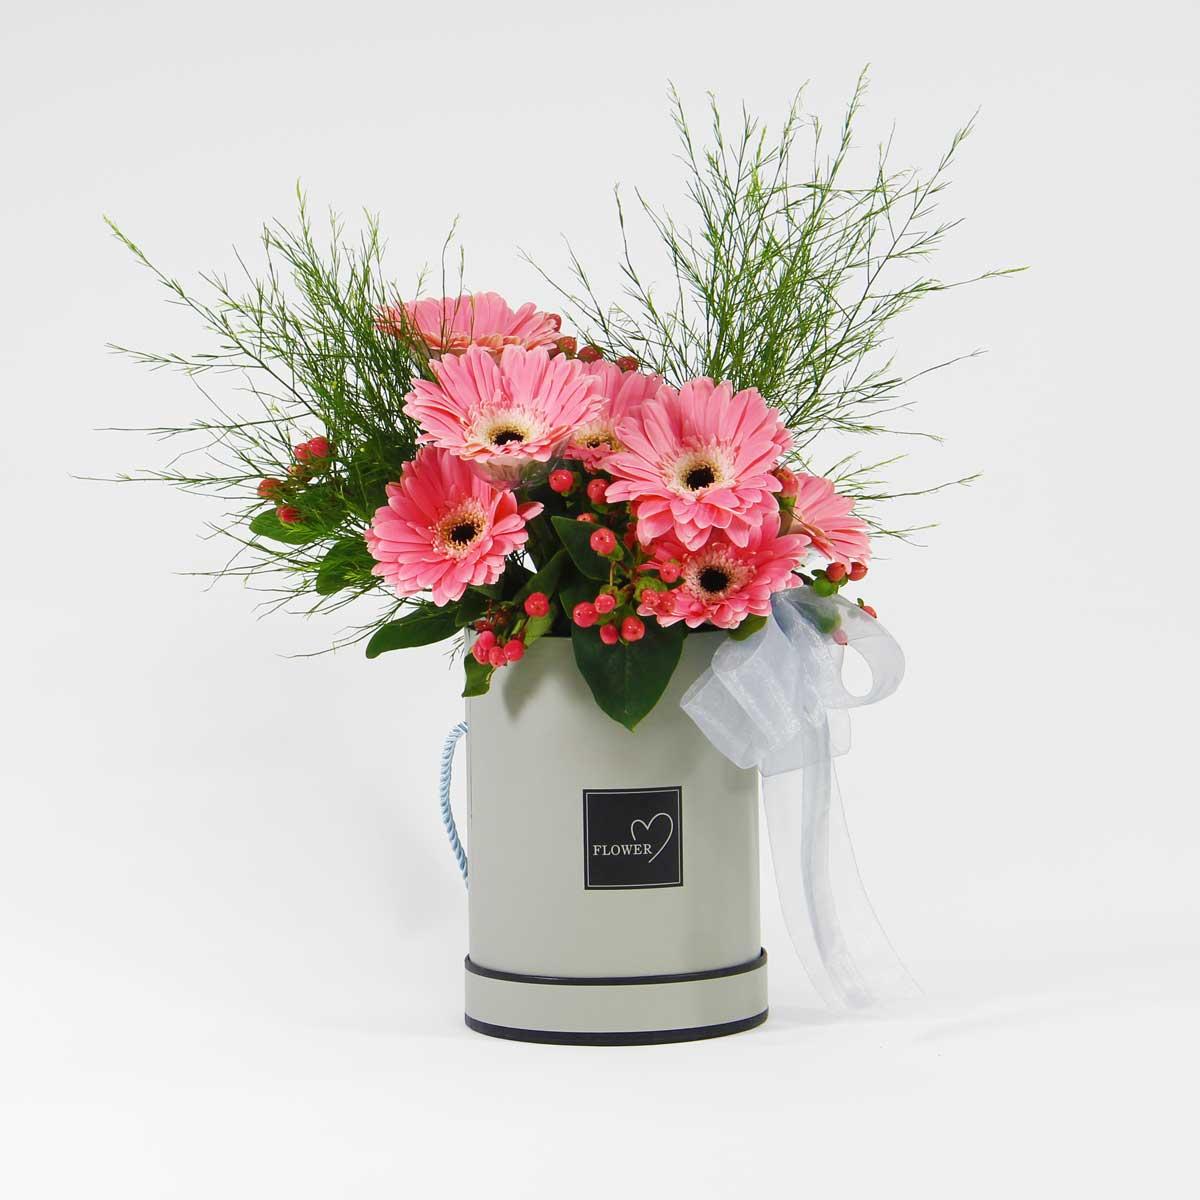 Daisies Flower Box | Eska Creative Gifting